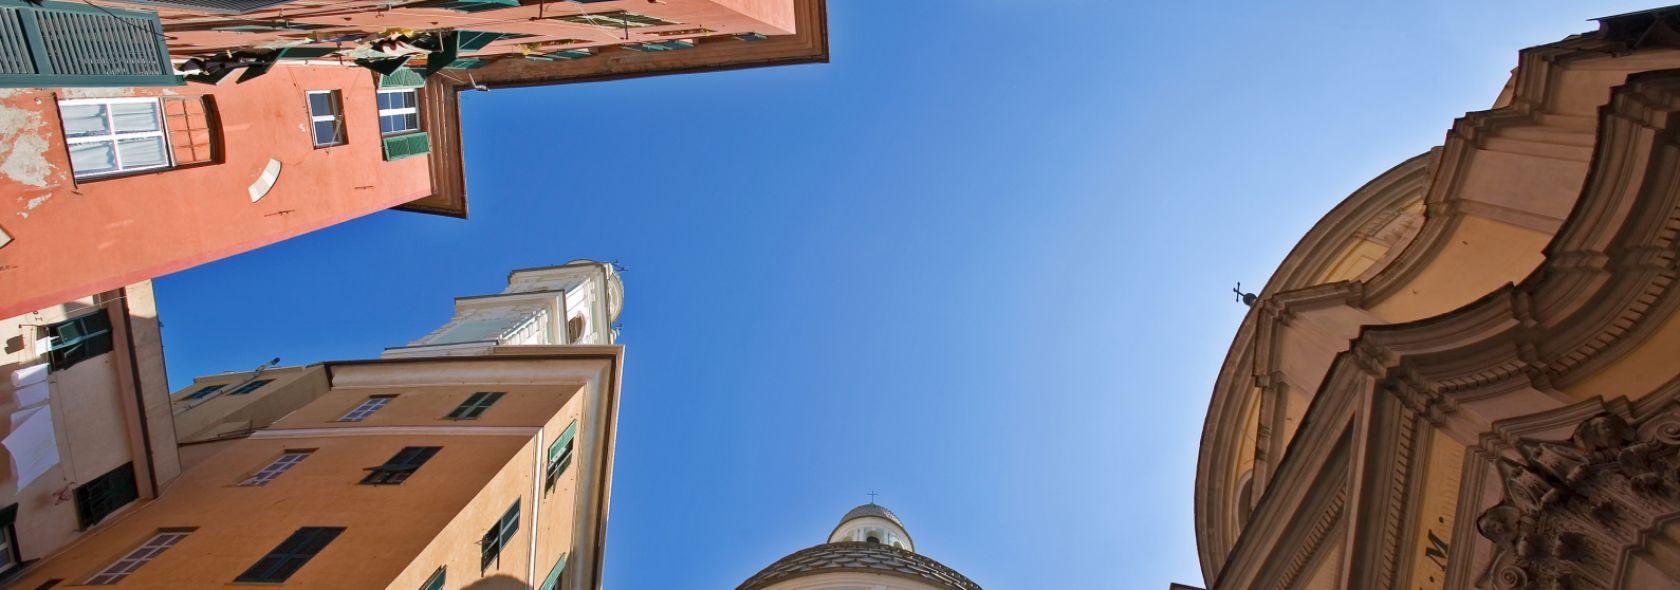 Centro Storico - Foto Stefano Goldberg